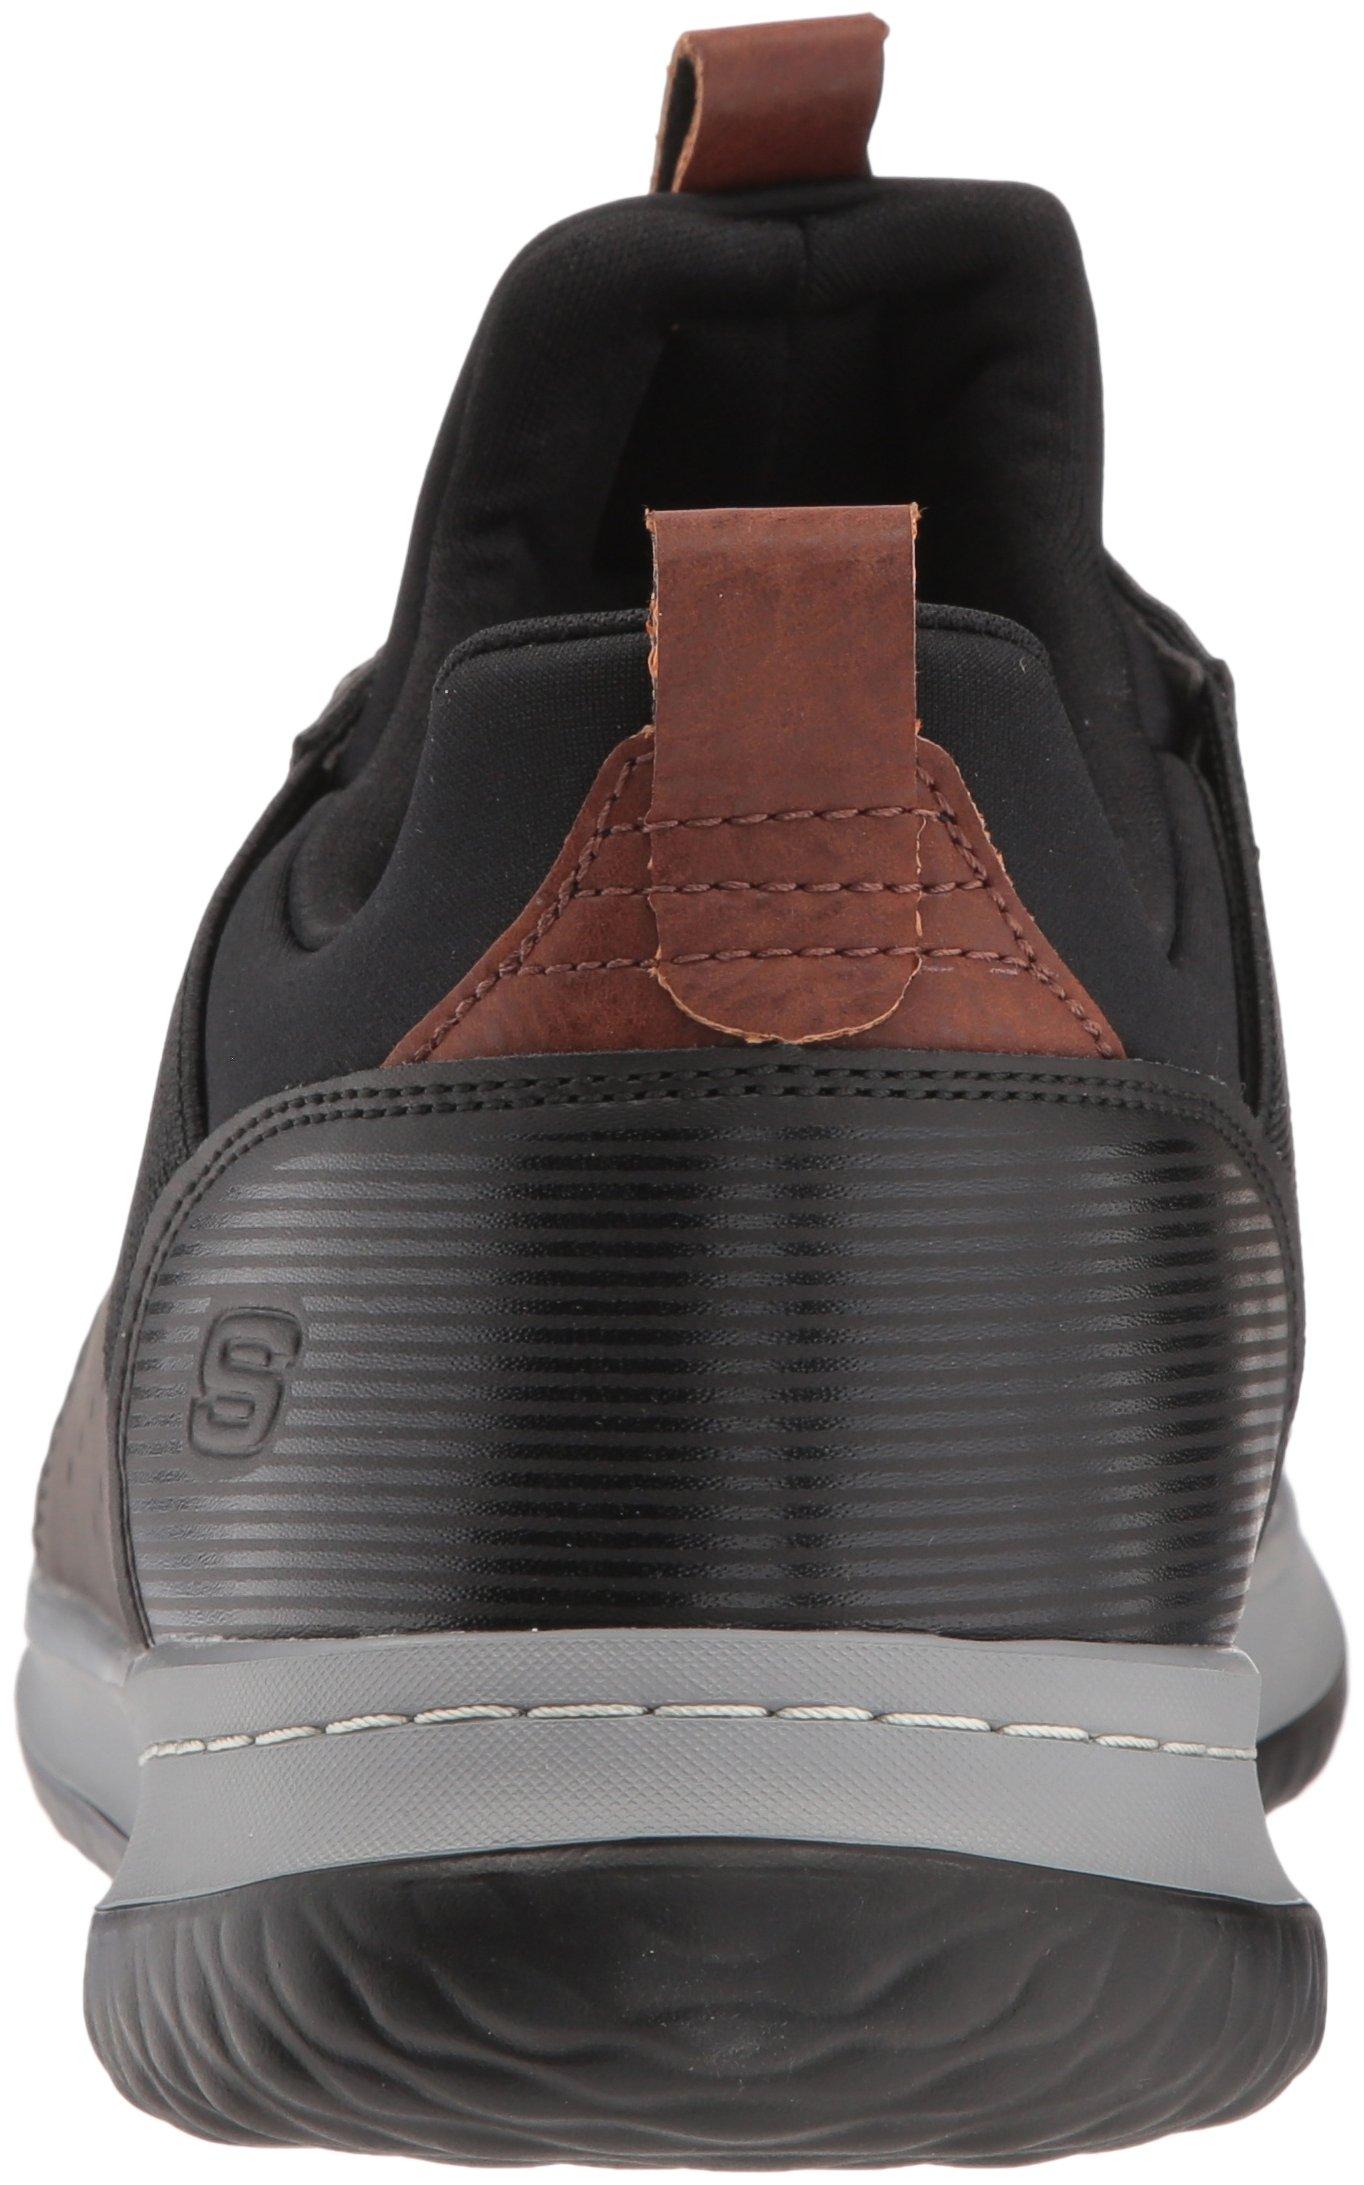 Skechers Men's Classic Fit-Delson-Camden Sneaker, Black/Grey,7 Wide US